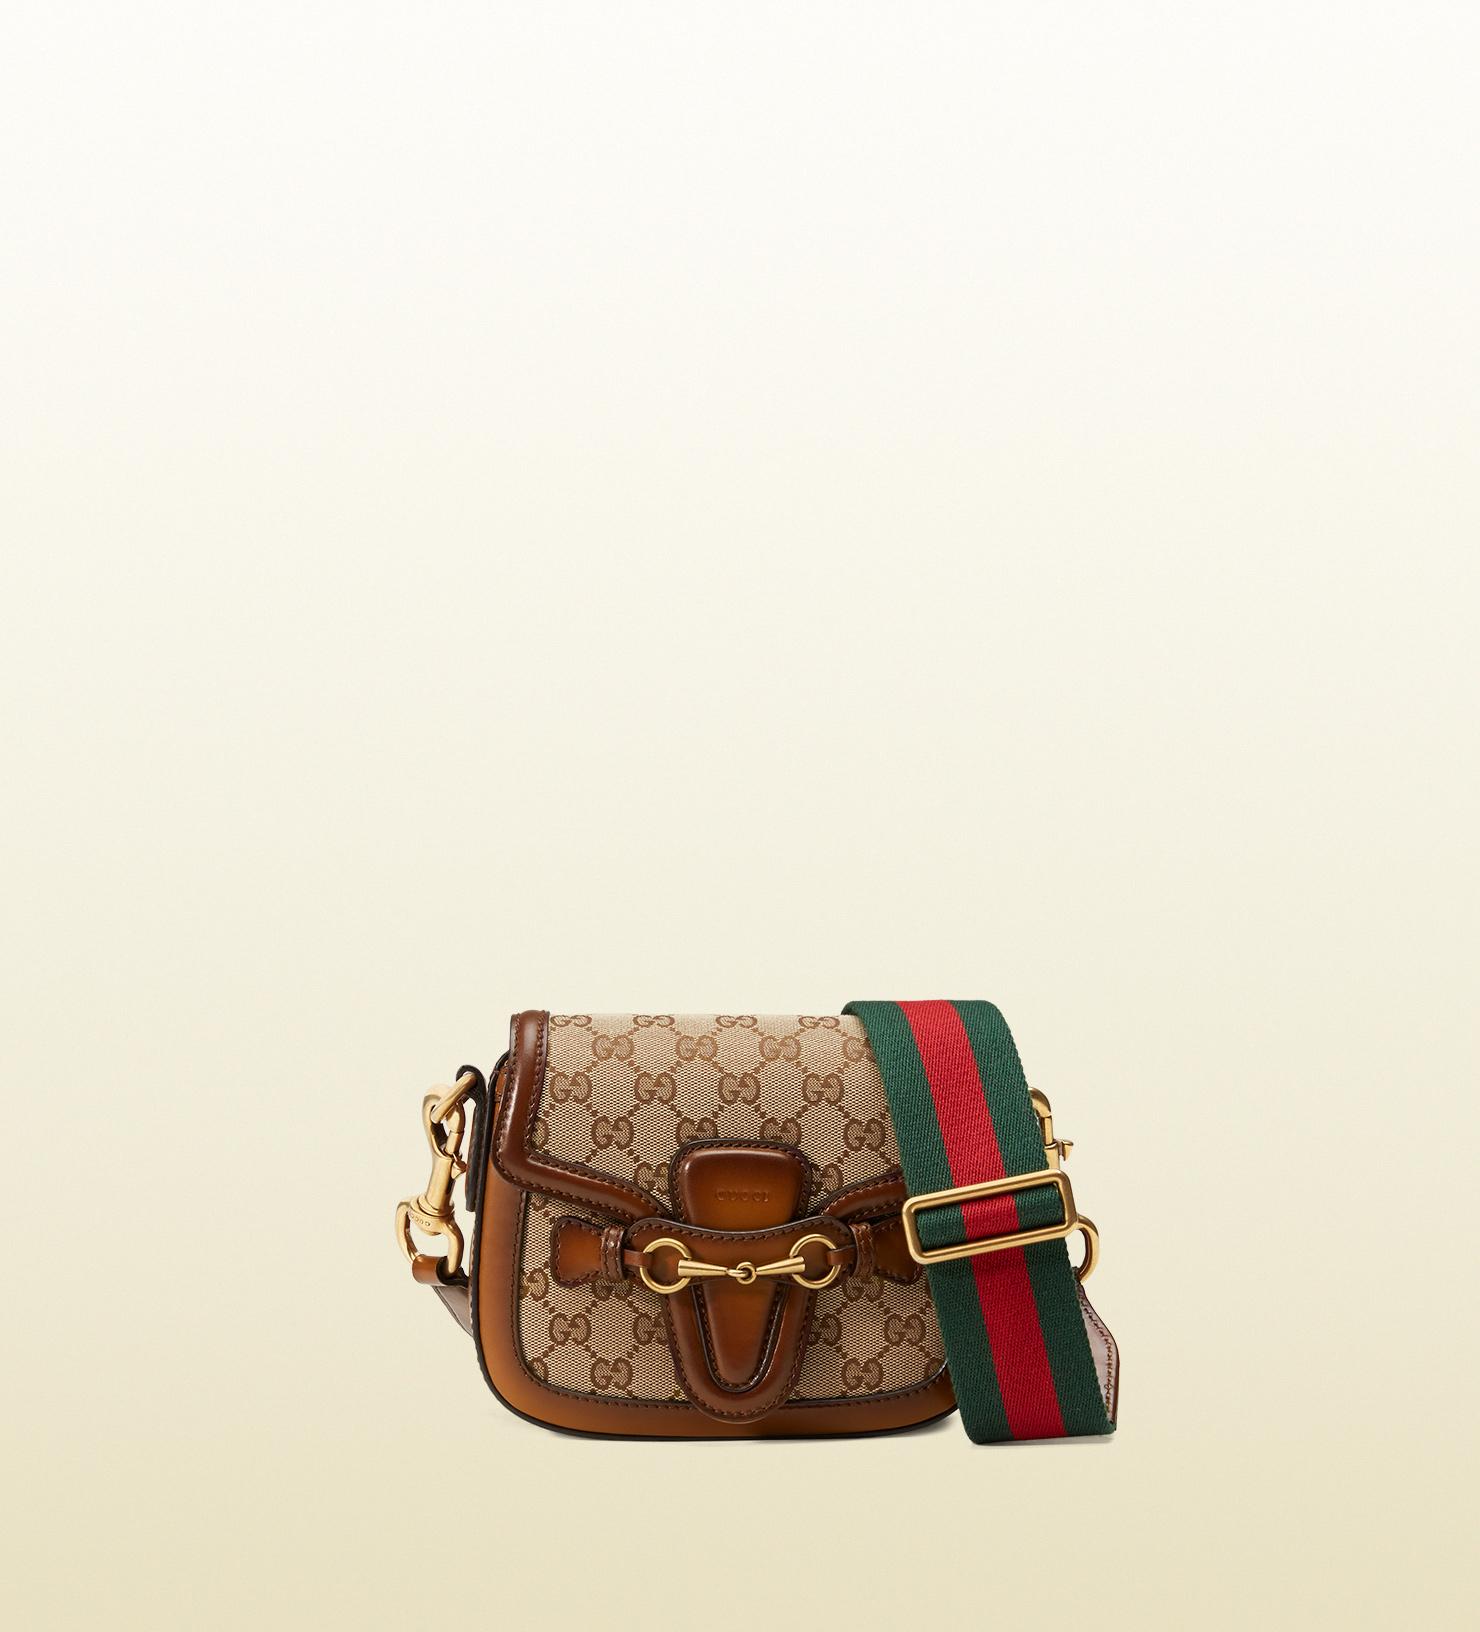 c1378908b0d91b Gucci Lady Web Original Gg Canvas Shoulder Bag in Brown - Lyst